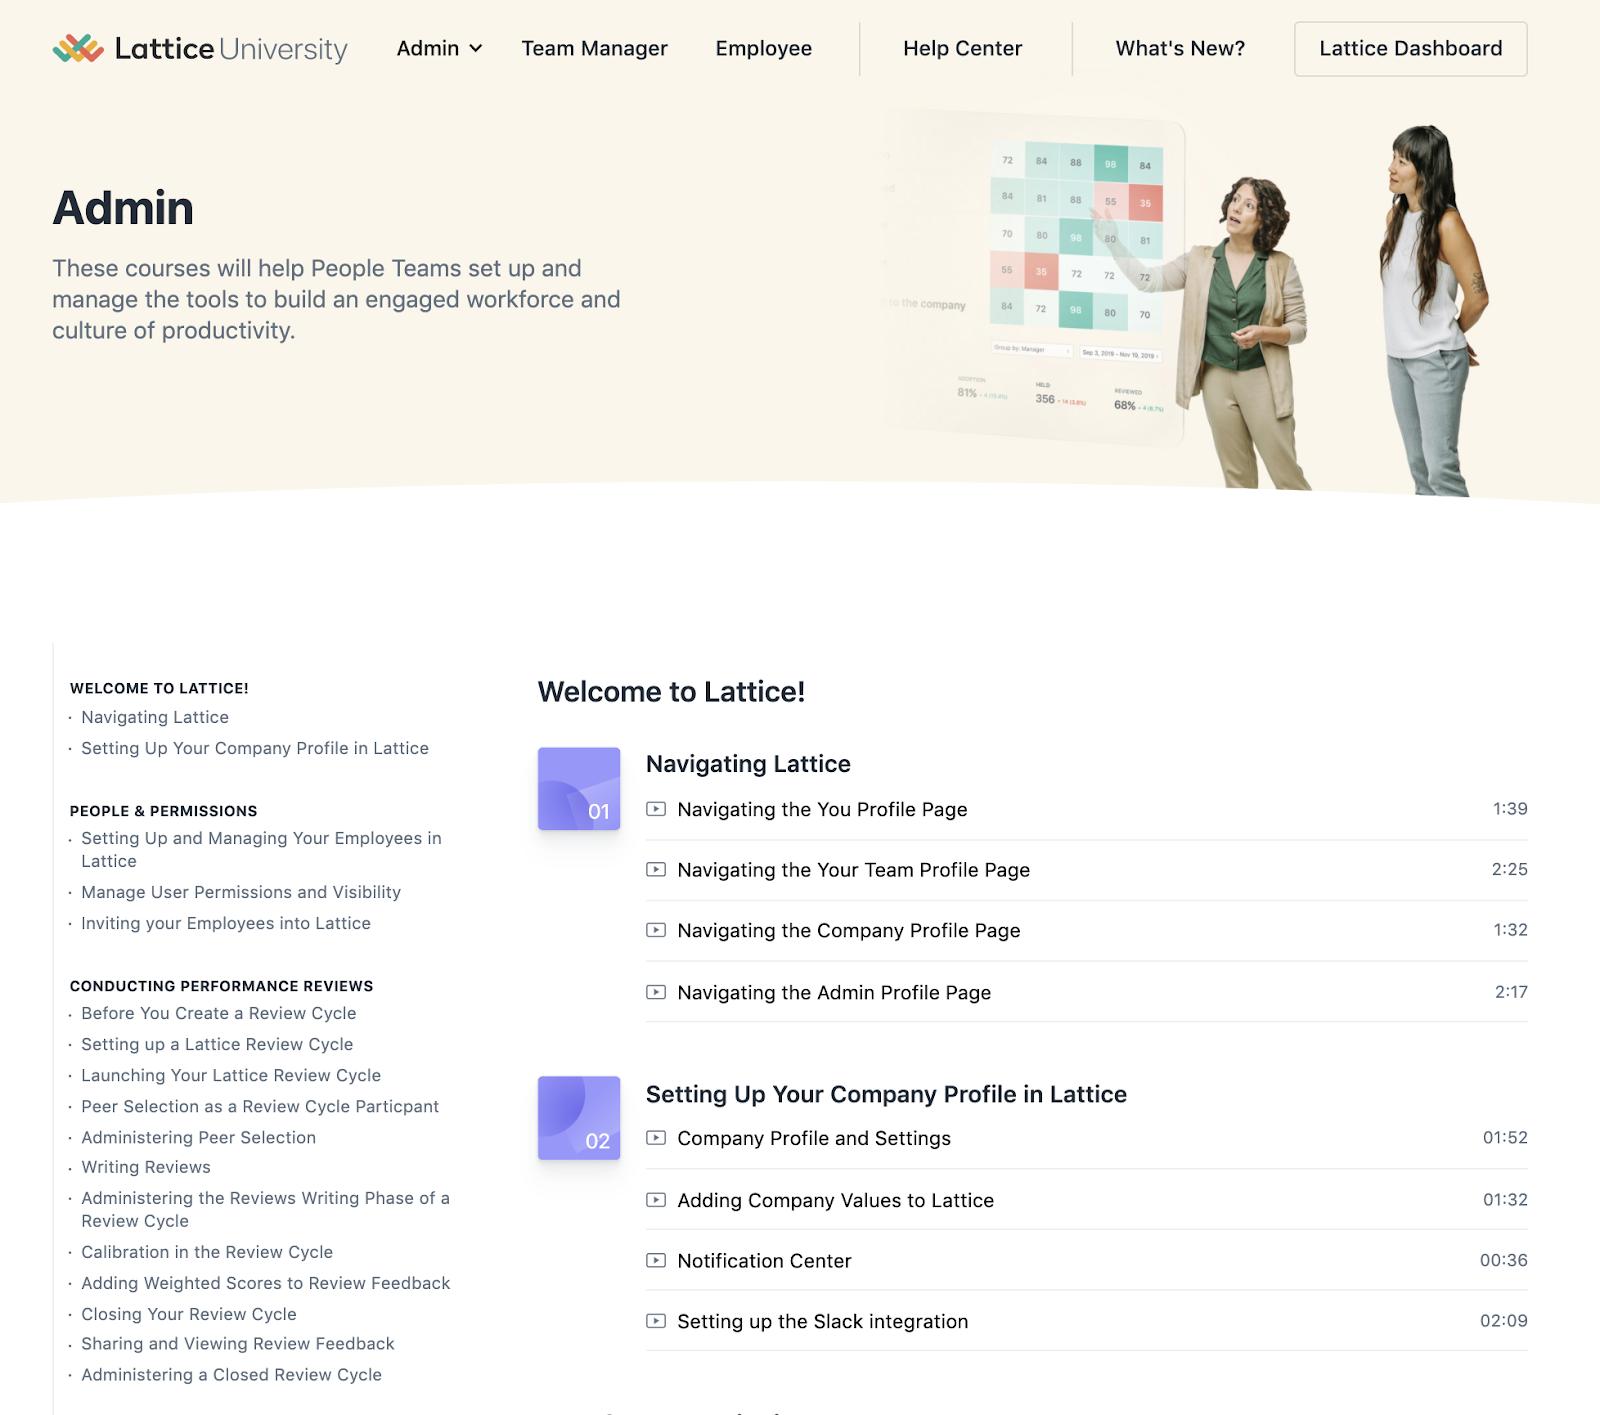 Lattice University